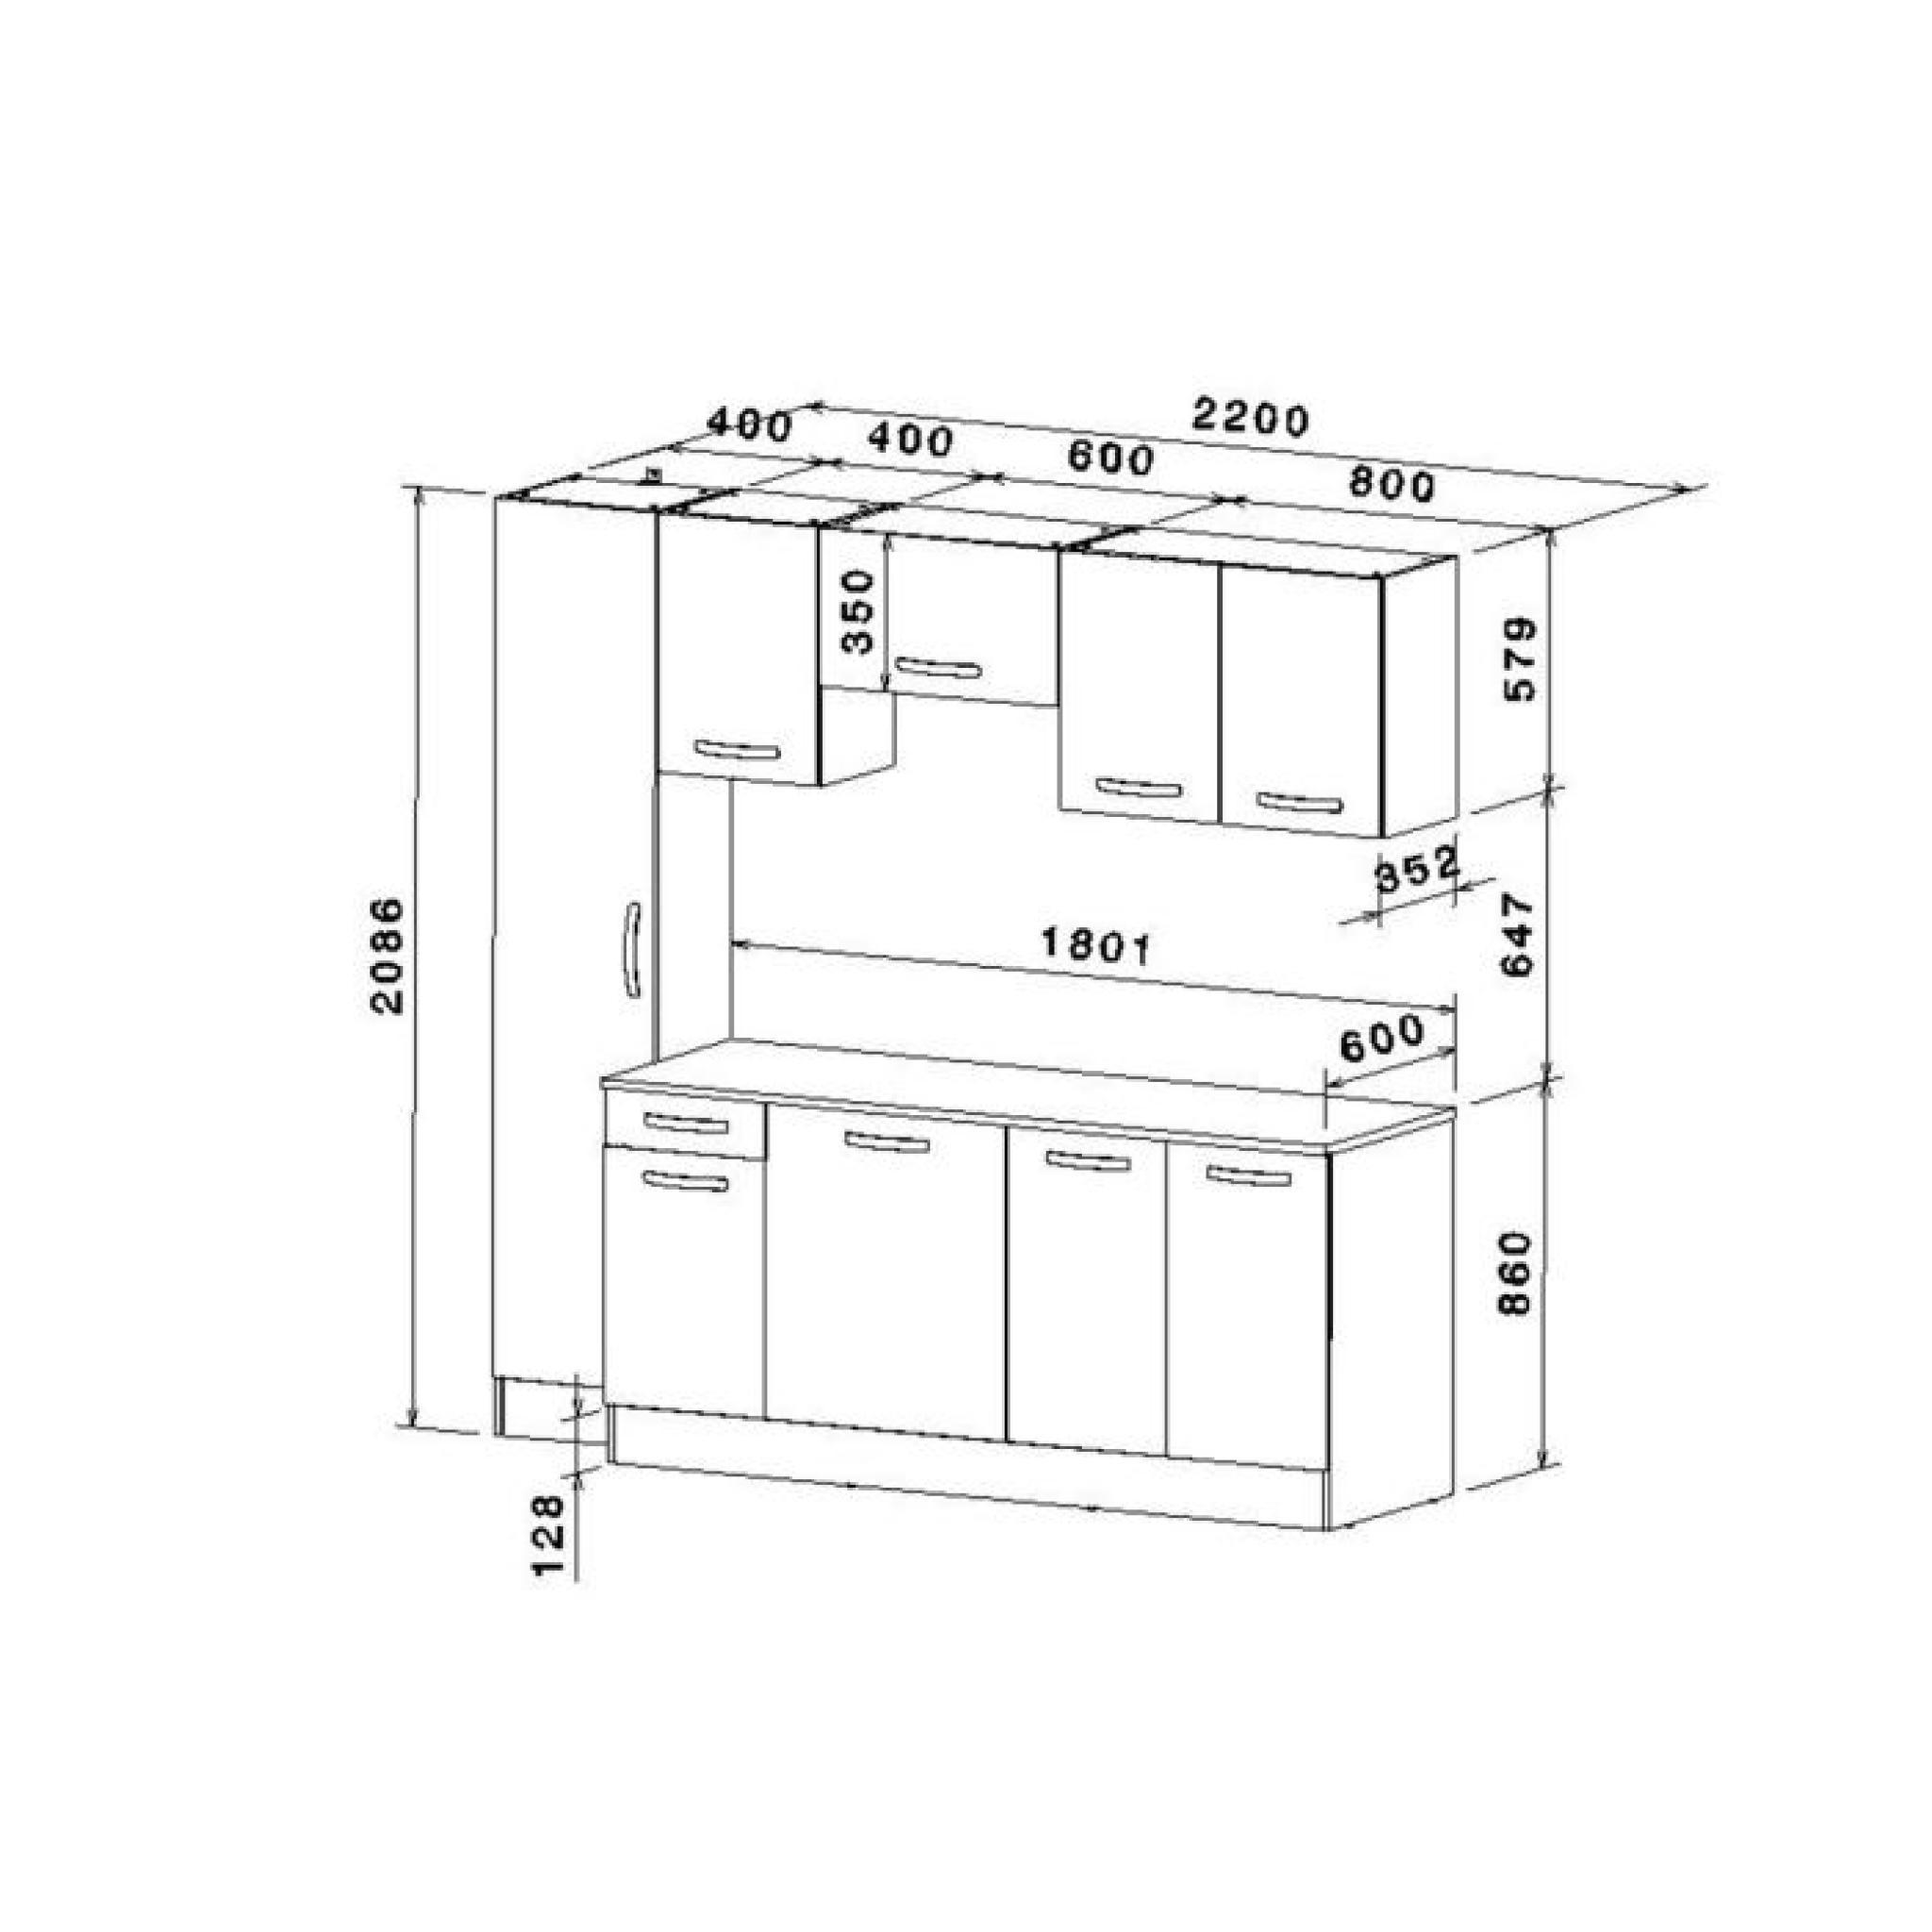 bloc cuisine complte gris aluminium aro pas cher with bloc cuisine pas cher. Black Bedroom Furniture Sets. Home Design Ideas